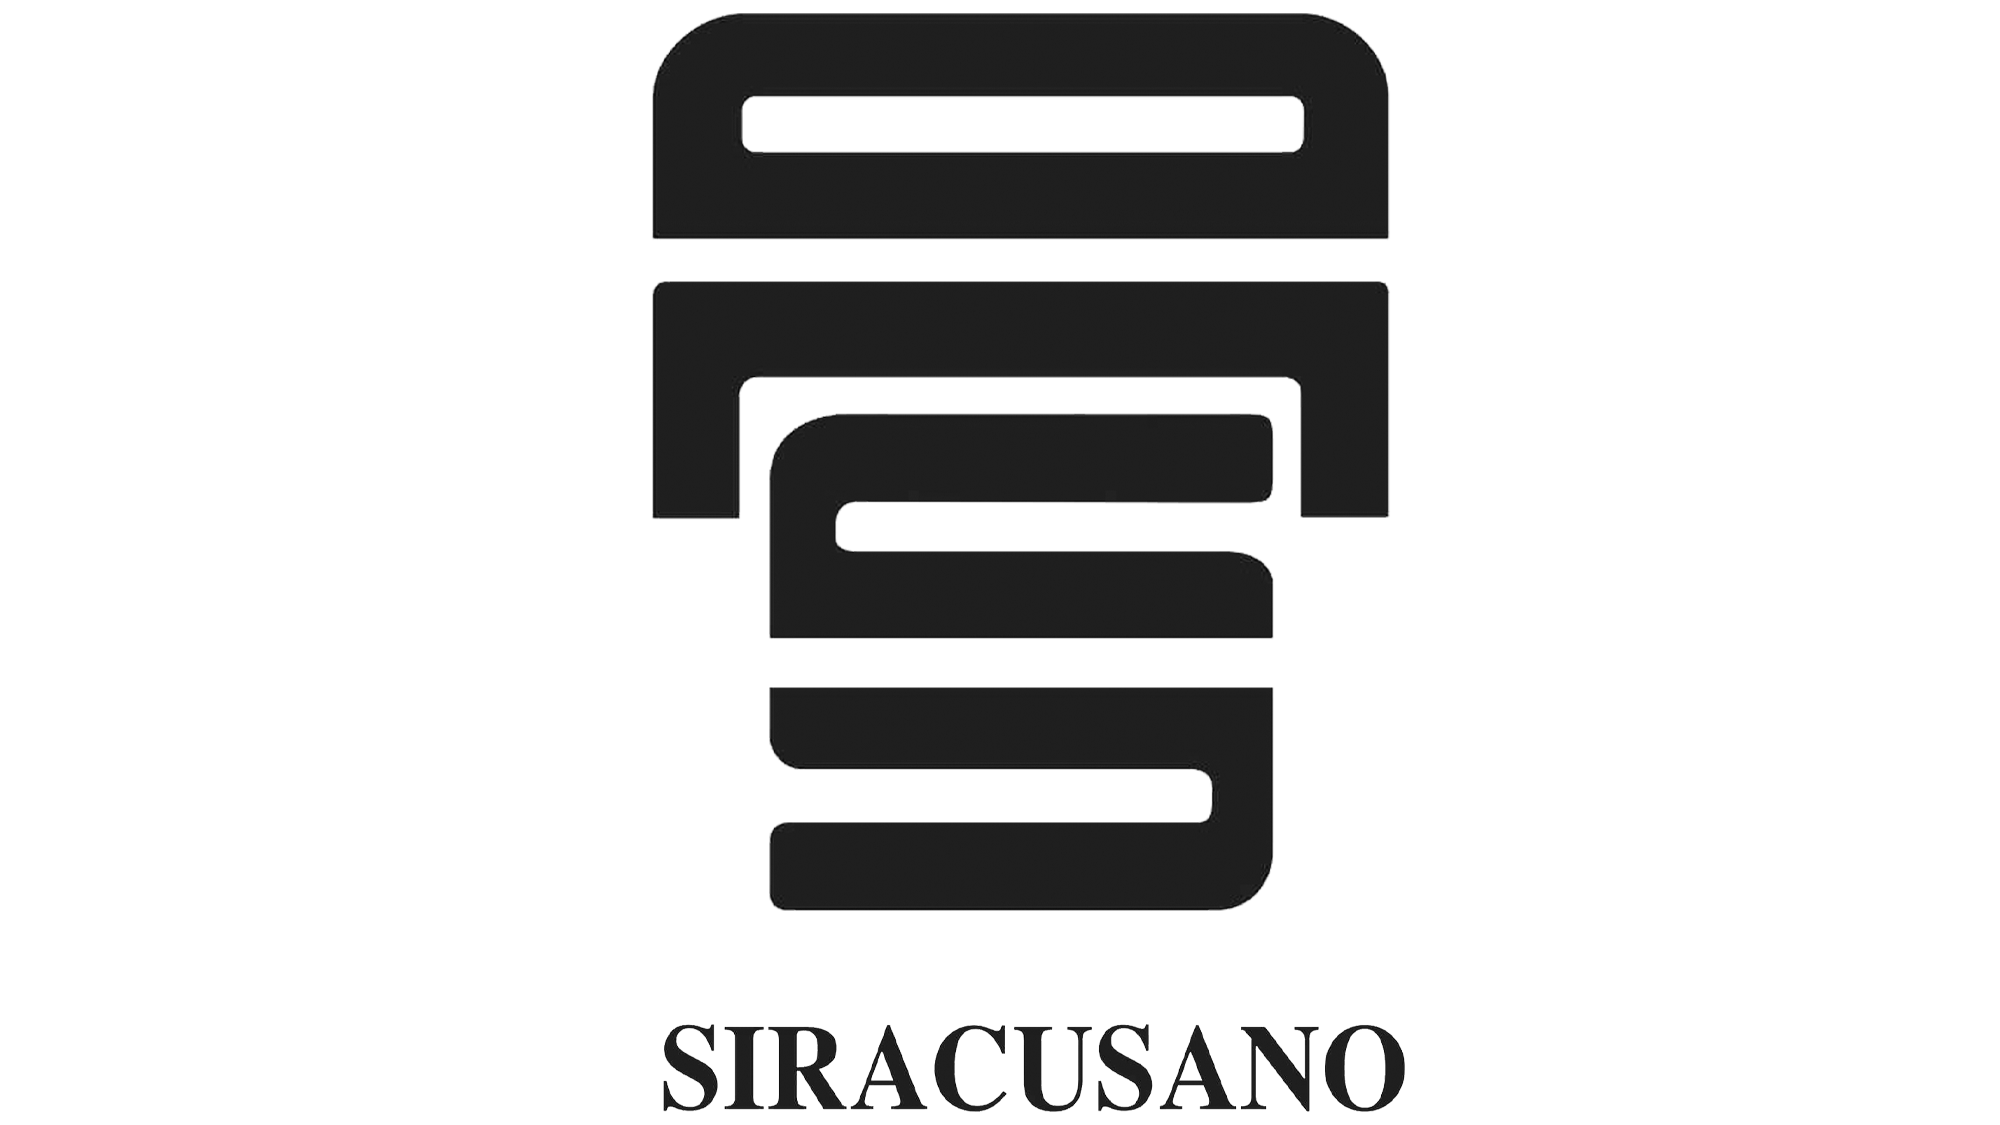 logo_5 ivan rizzitano